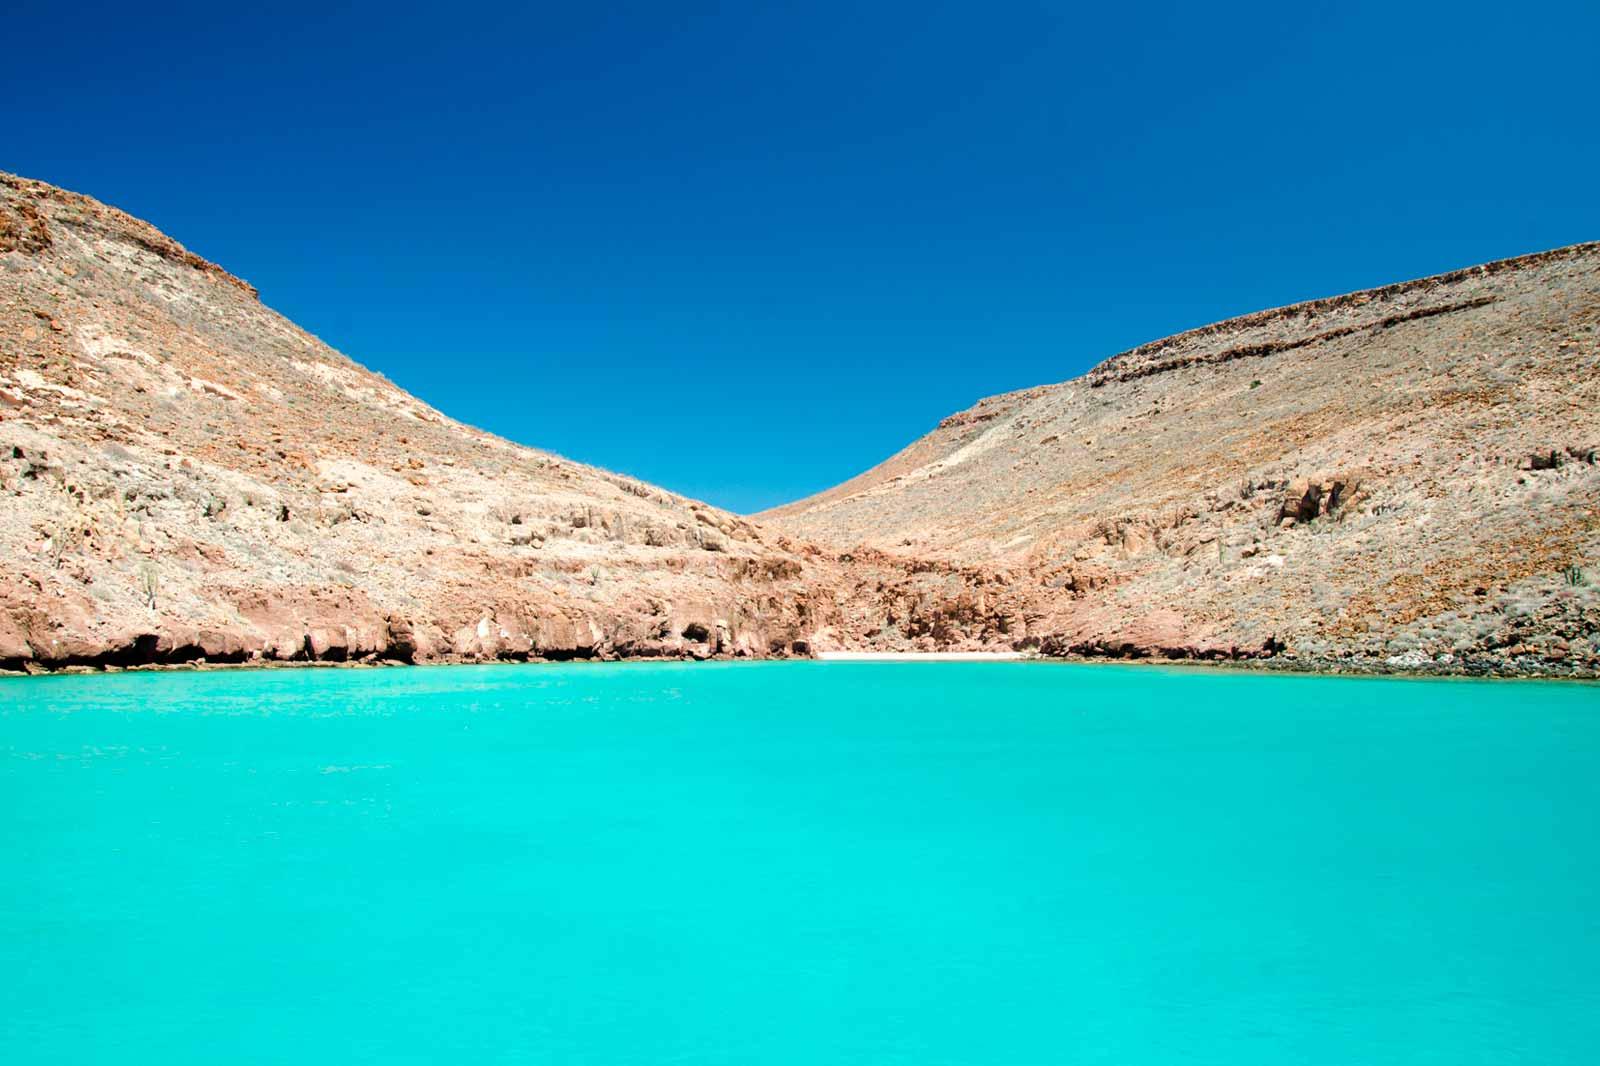 mexicofinder-travel-top-destinations-la-paz-baja-california-espiritu-santo